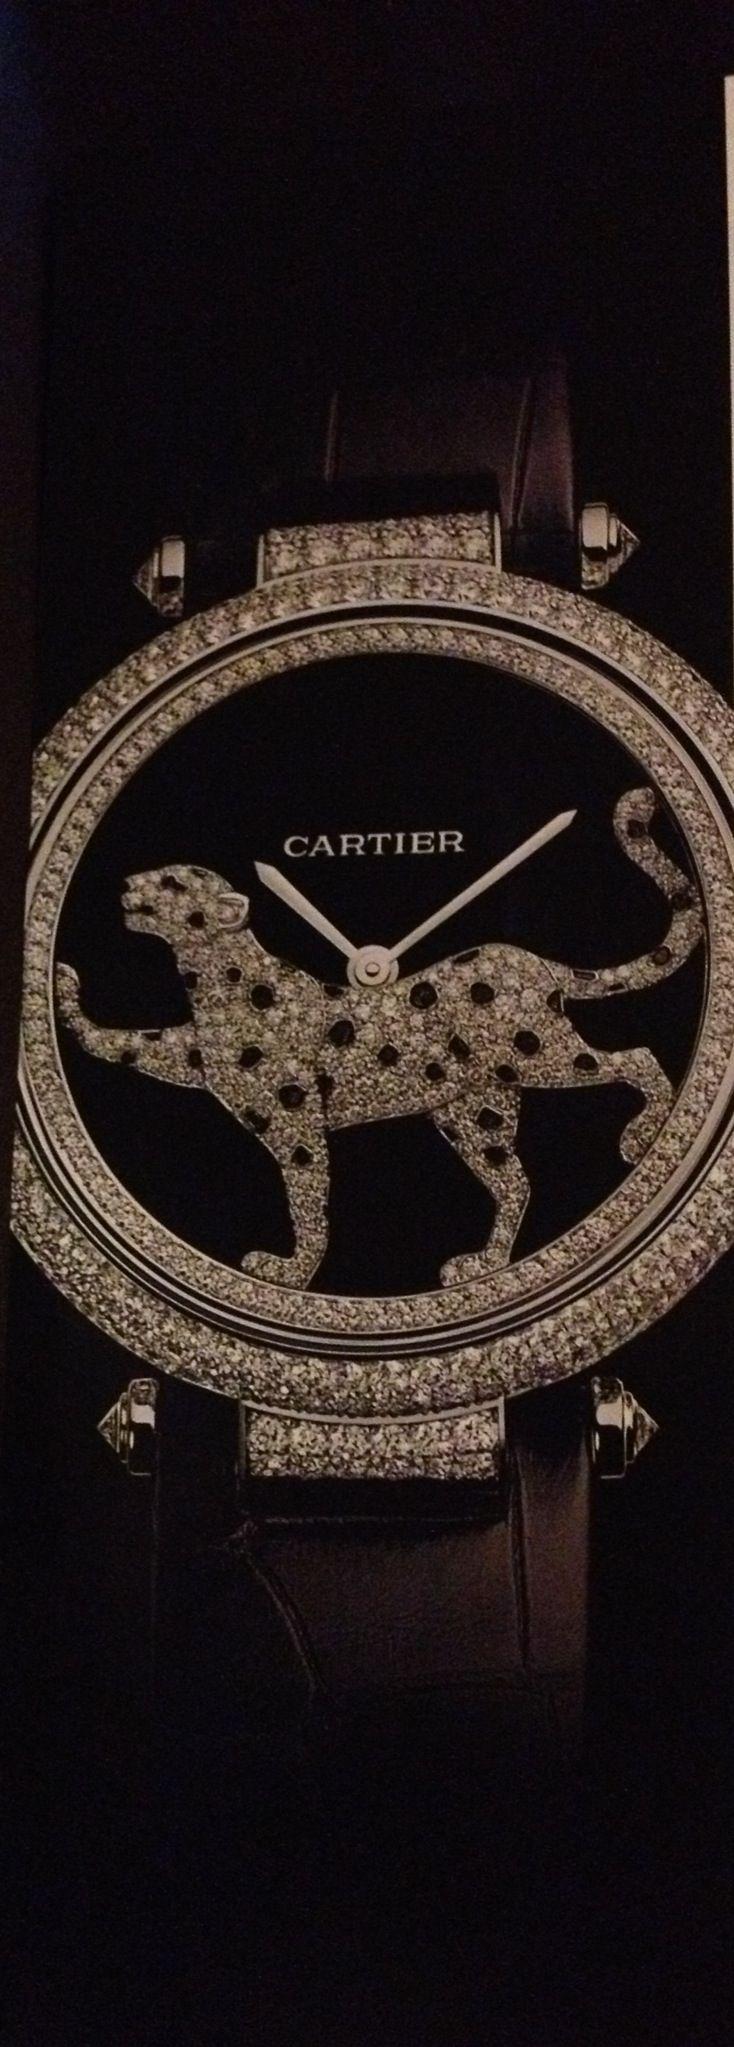 Cartier Rolex jewelry watch for  women. Cartier some of the worlds finest watch craftsman.